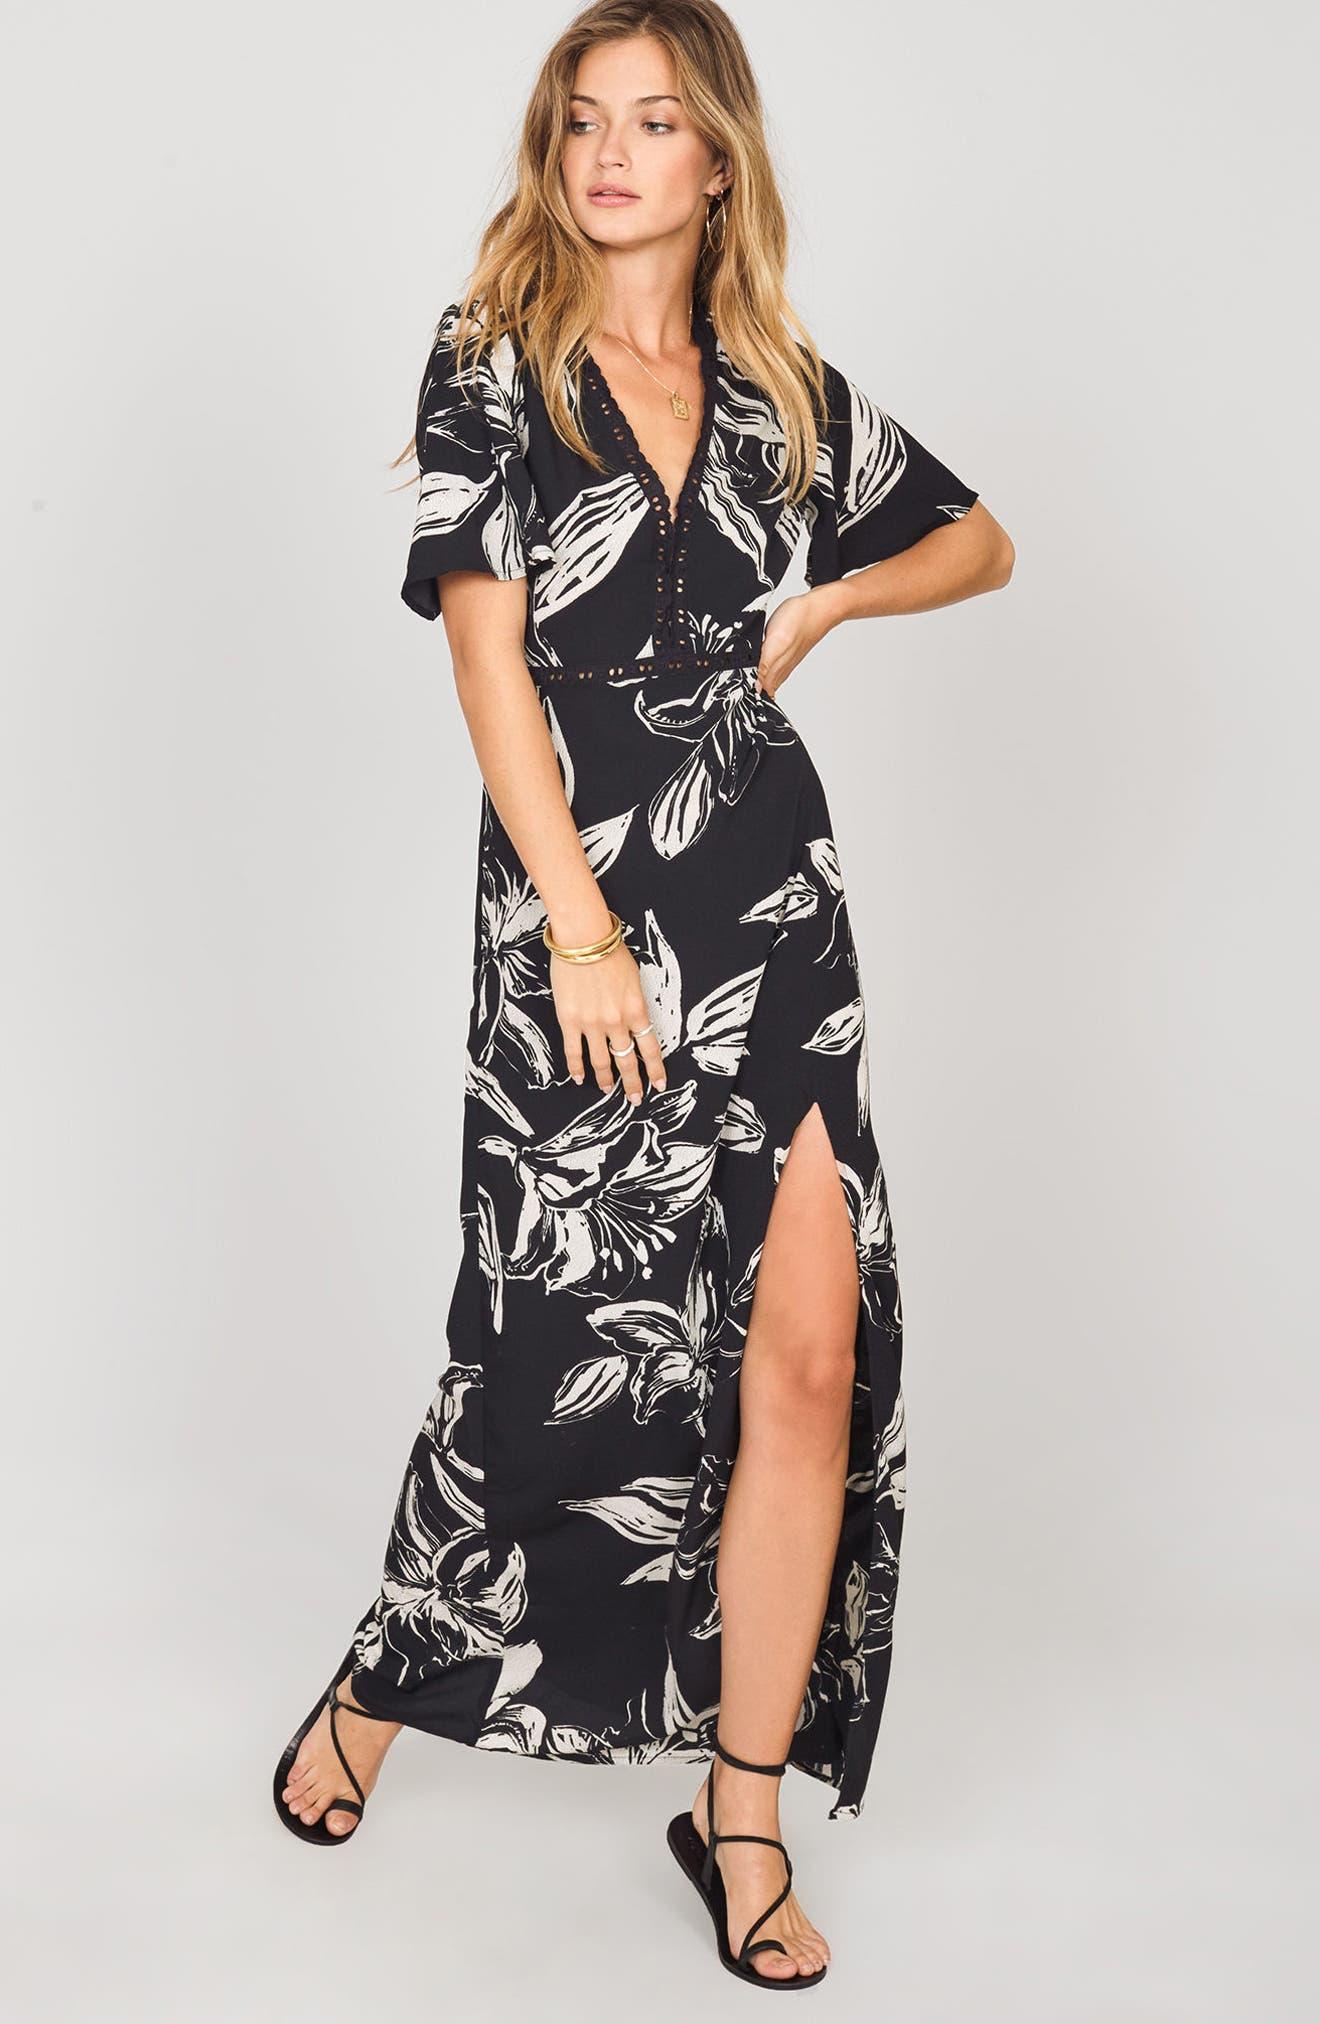 Seaside Floral Print Maxi Dress,                             Alternate thumbnail 4, color,                             001